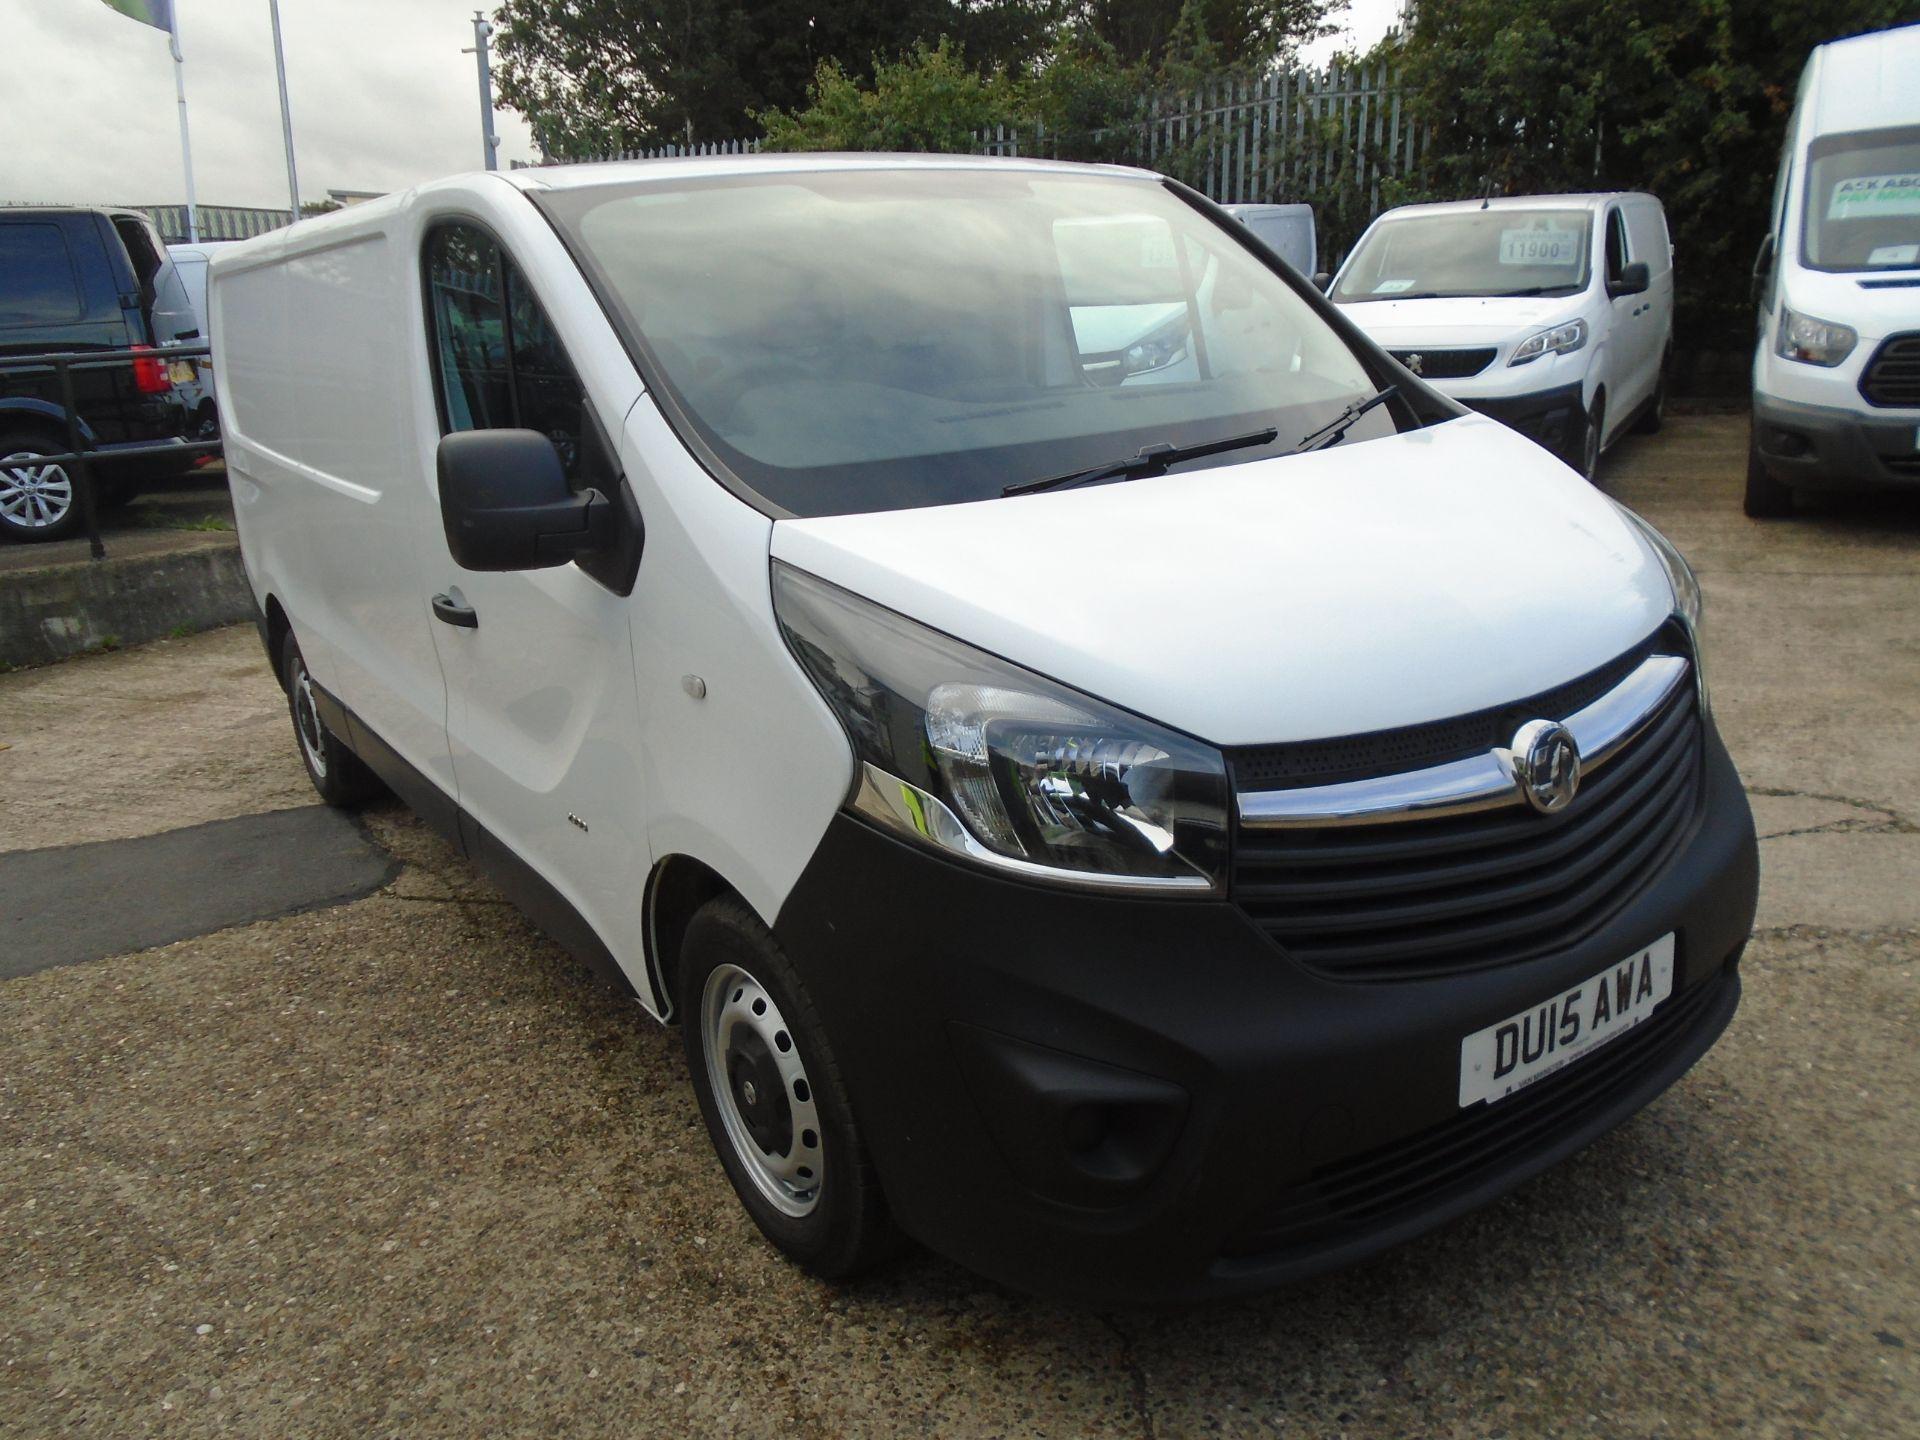 2015 Vauxhall Vivaro 2900 1.6Cdti 115Ps H1 Van (DU15AWA)